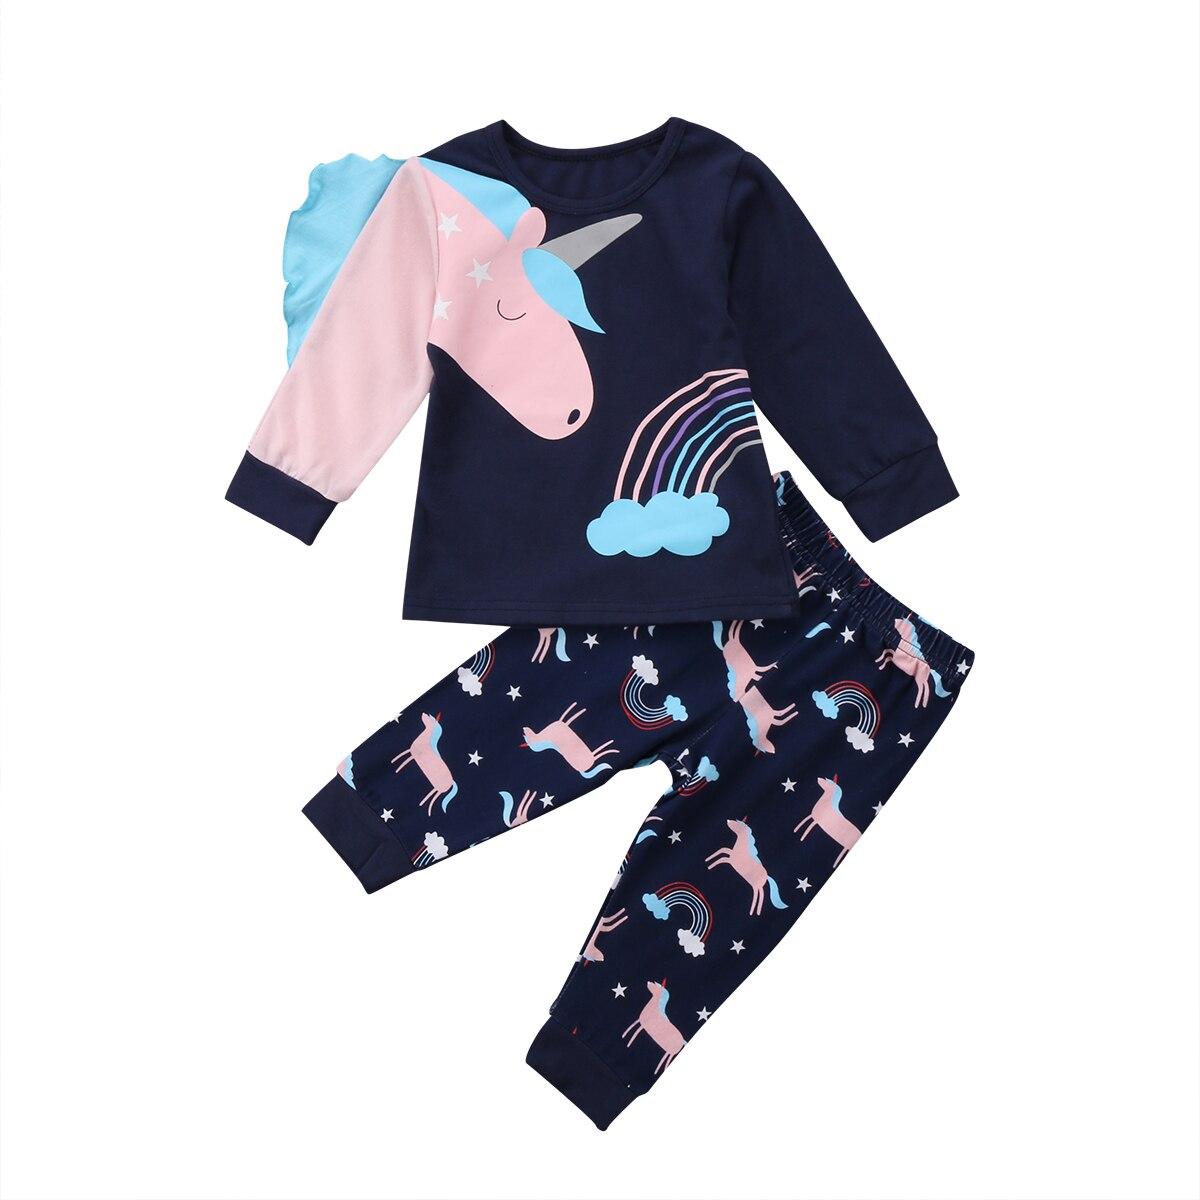 Royalblue, estampado de arco iris de unicornio, ropa de casa informal, bonitos niños, niñas, unicornio de algodón, Top, trajes con pantalones largos